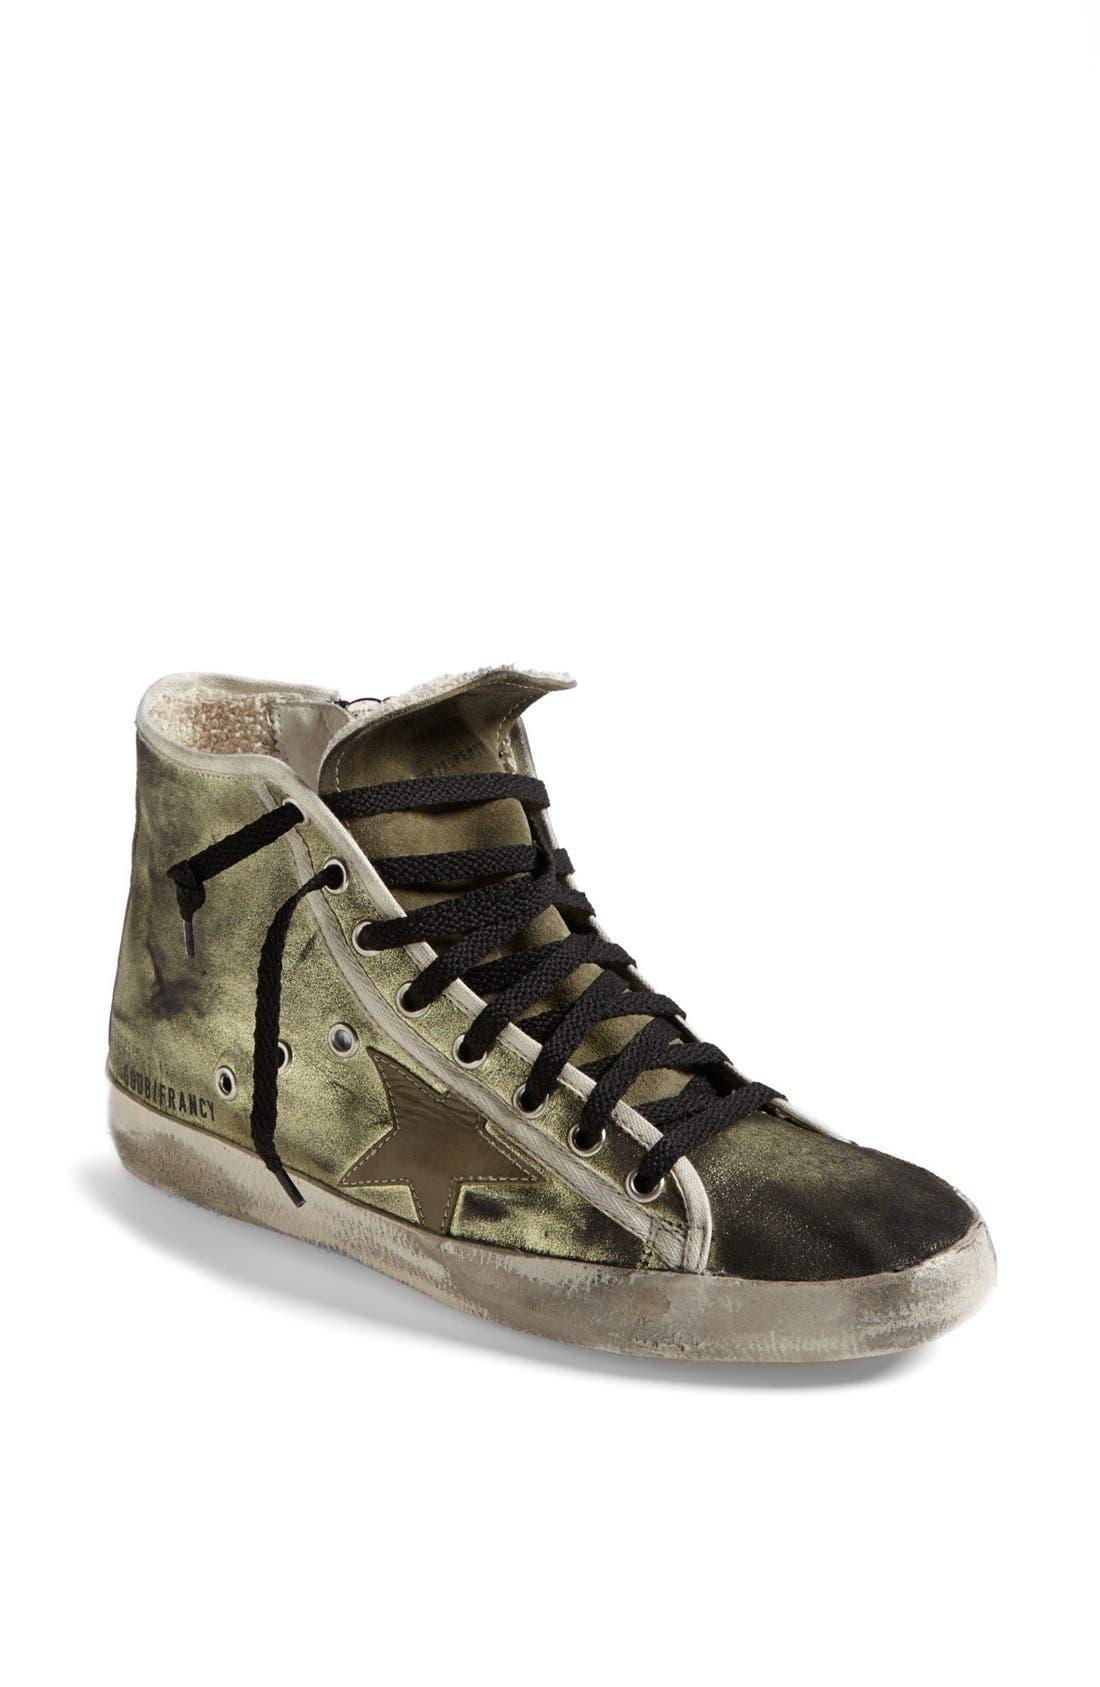 Alternate Image 1 Selected - Golden Goose 'Francy' High Top Sneaker